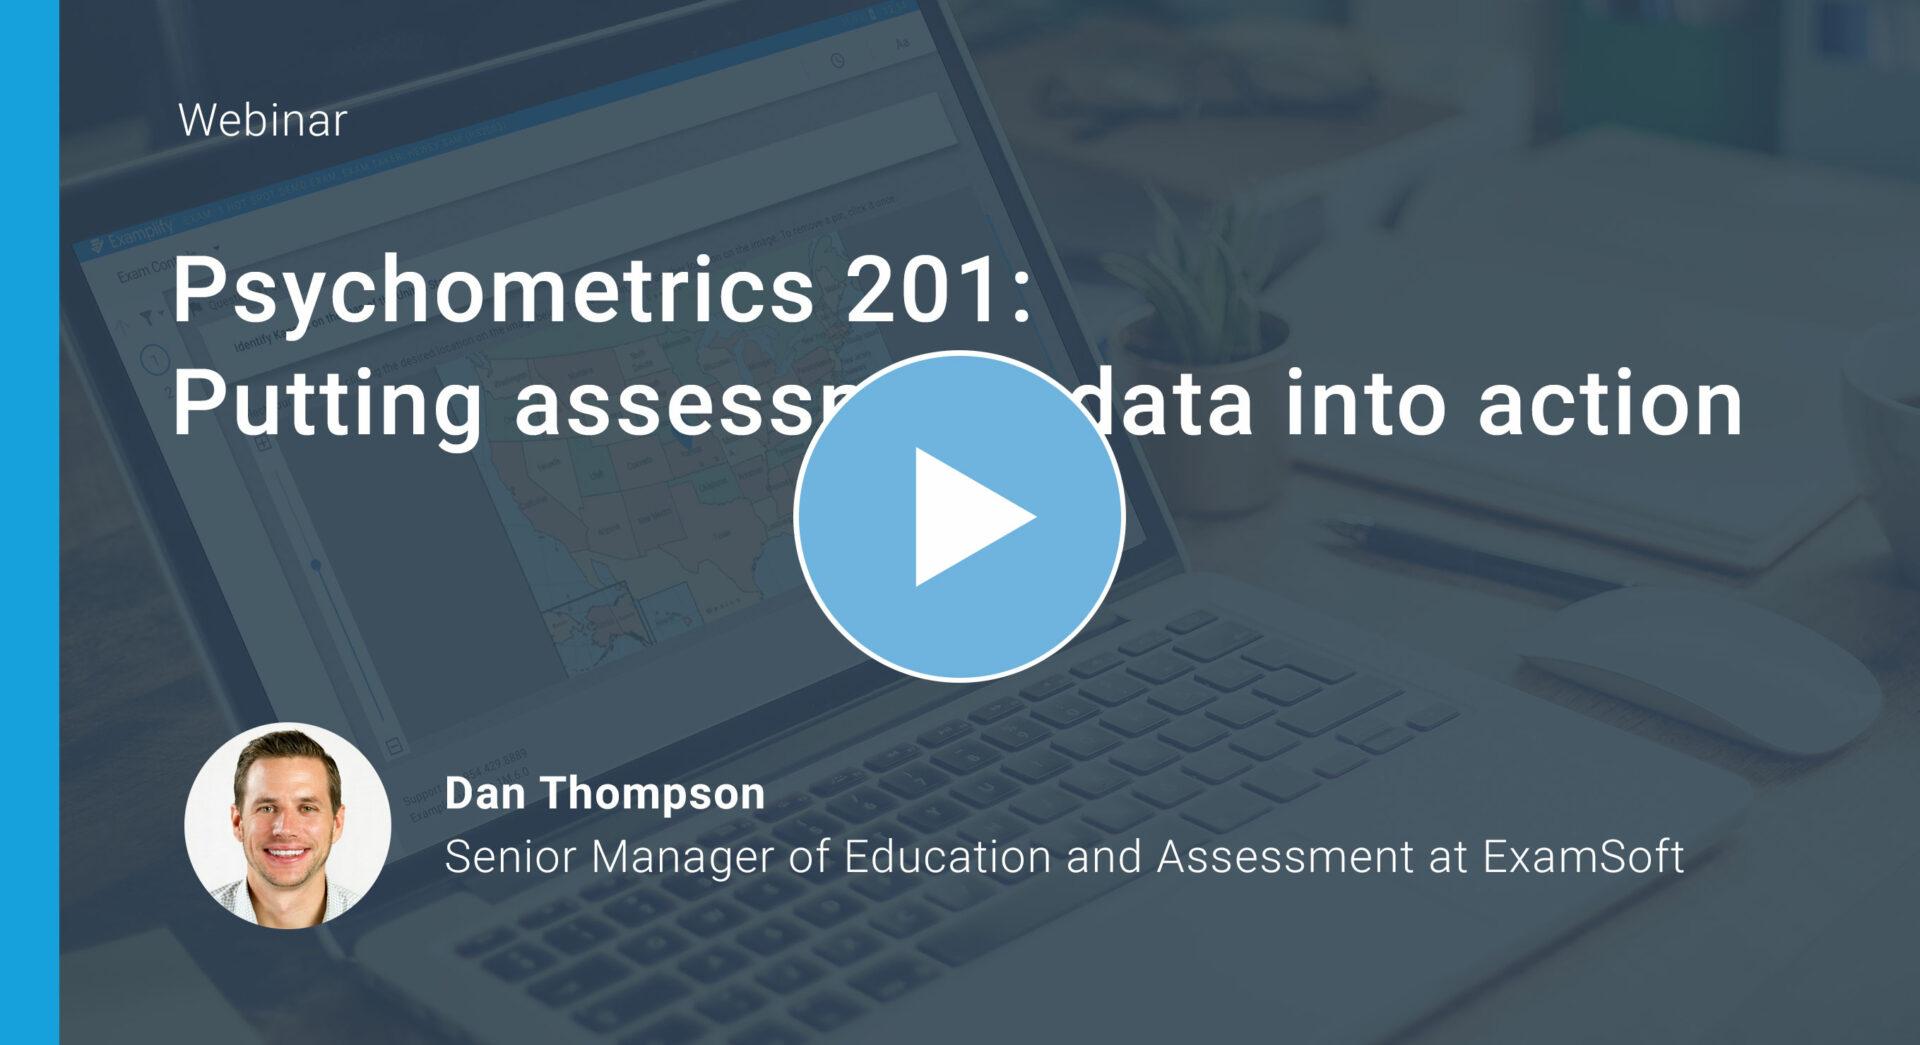 Psychometrics 201: Putting Assessment Data into Action